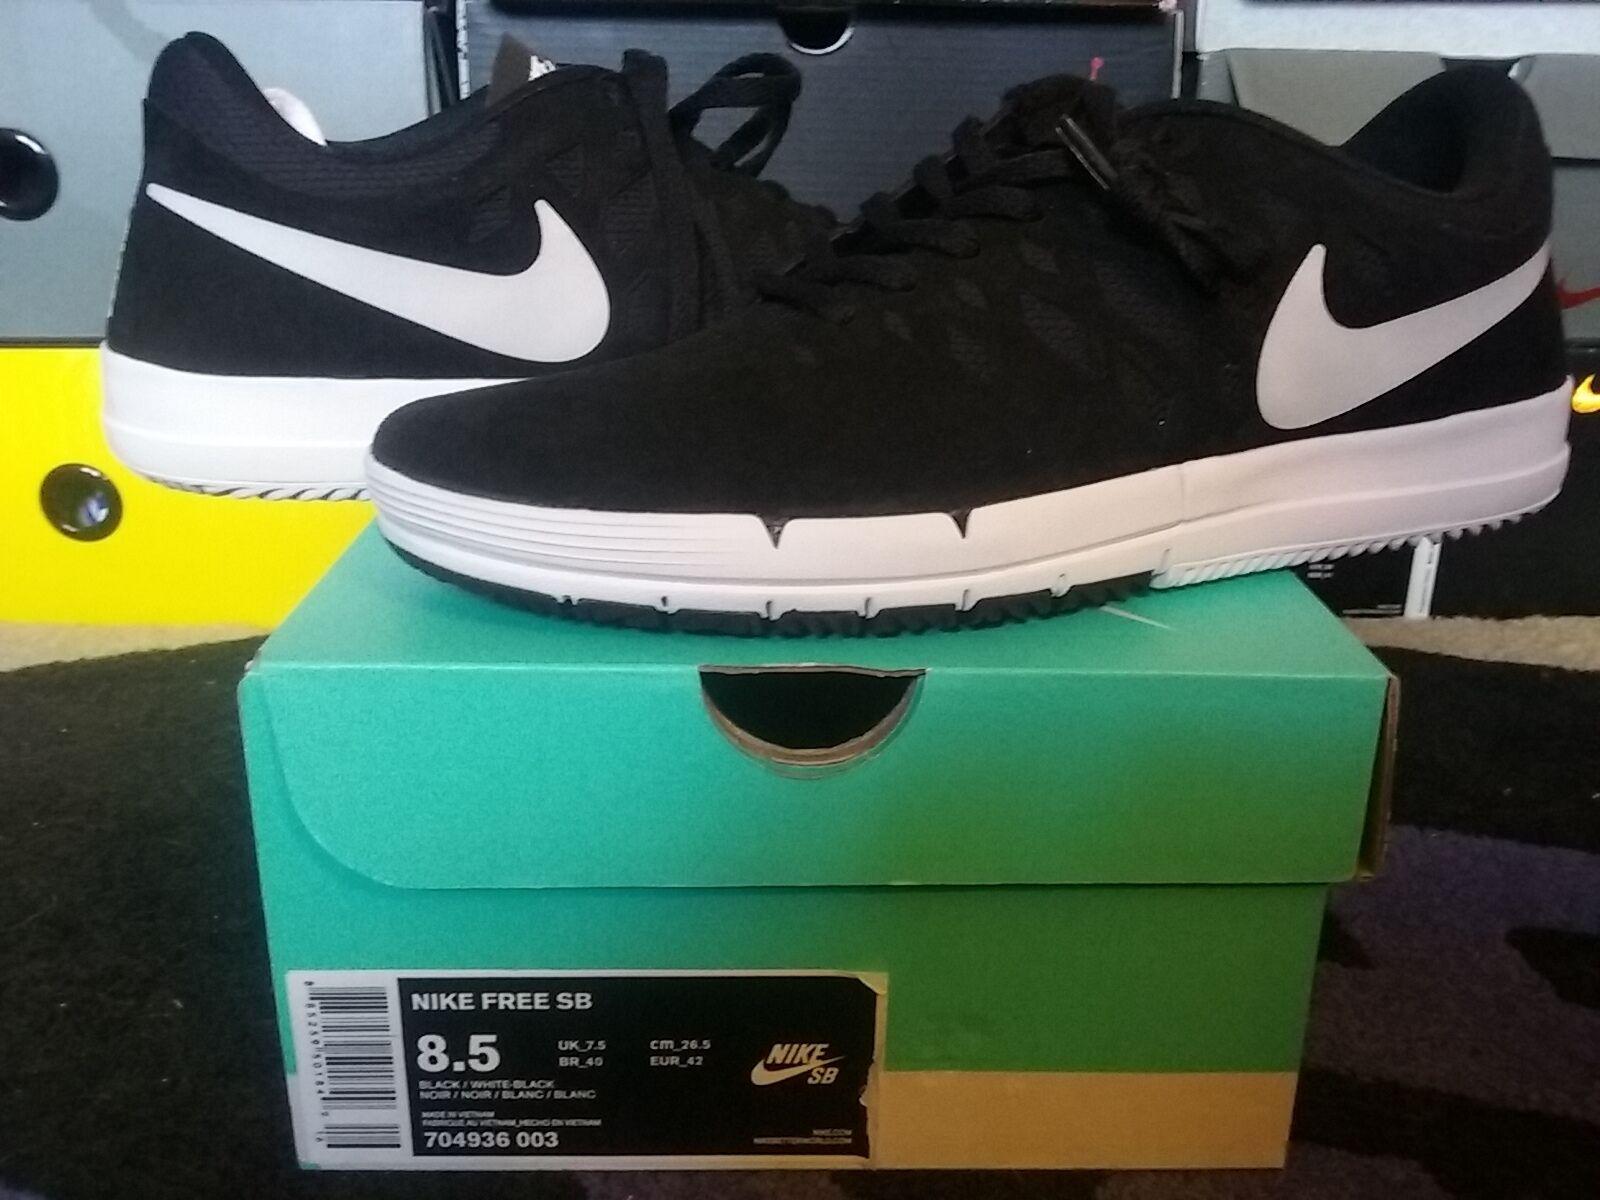 Nike Air Zoom Free SB Black White dunk low mid high pro janoski p rod 704936 003